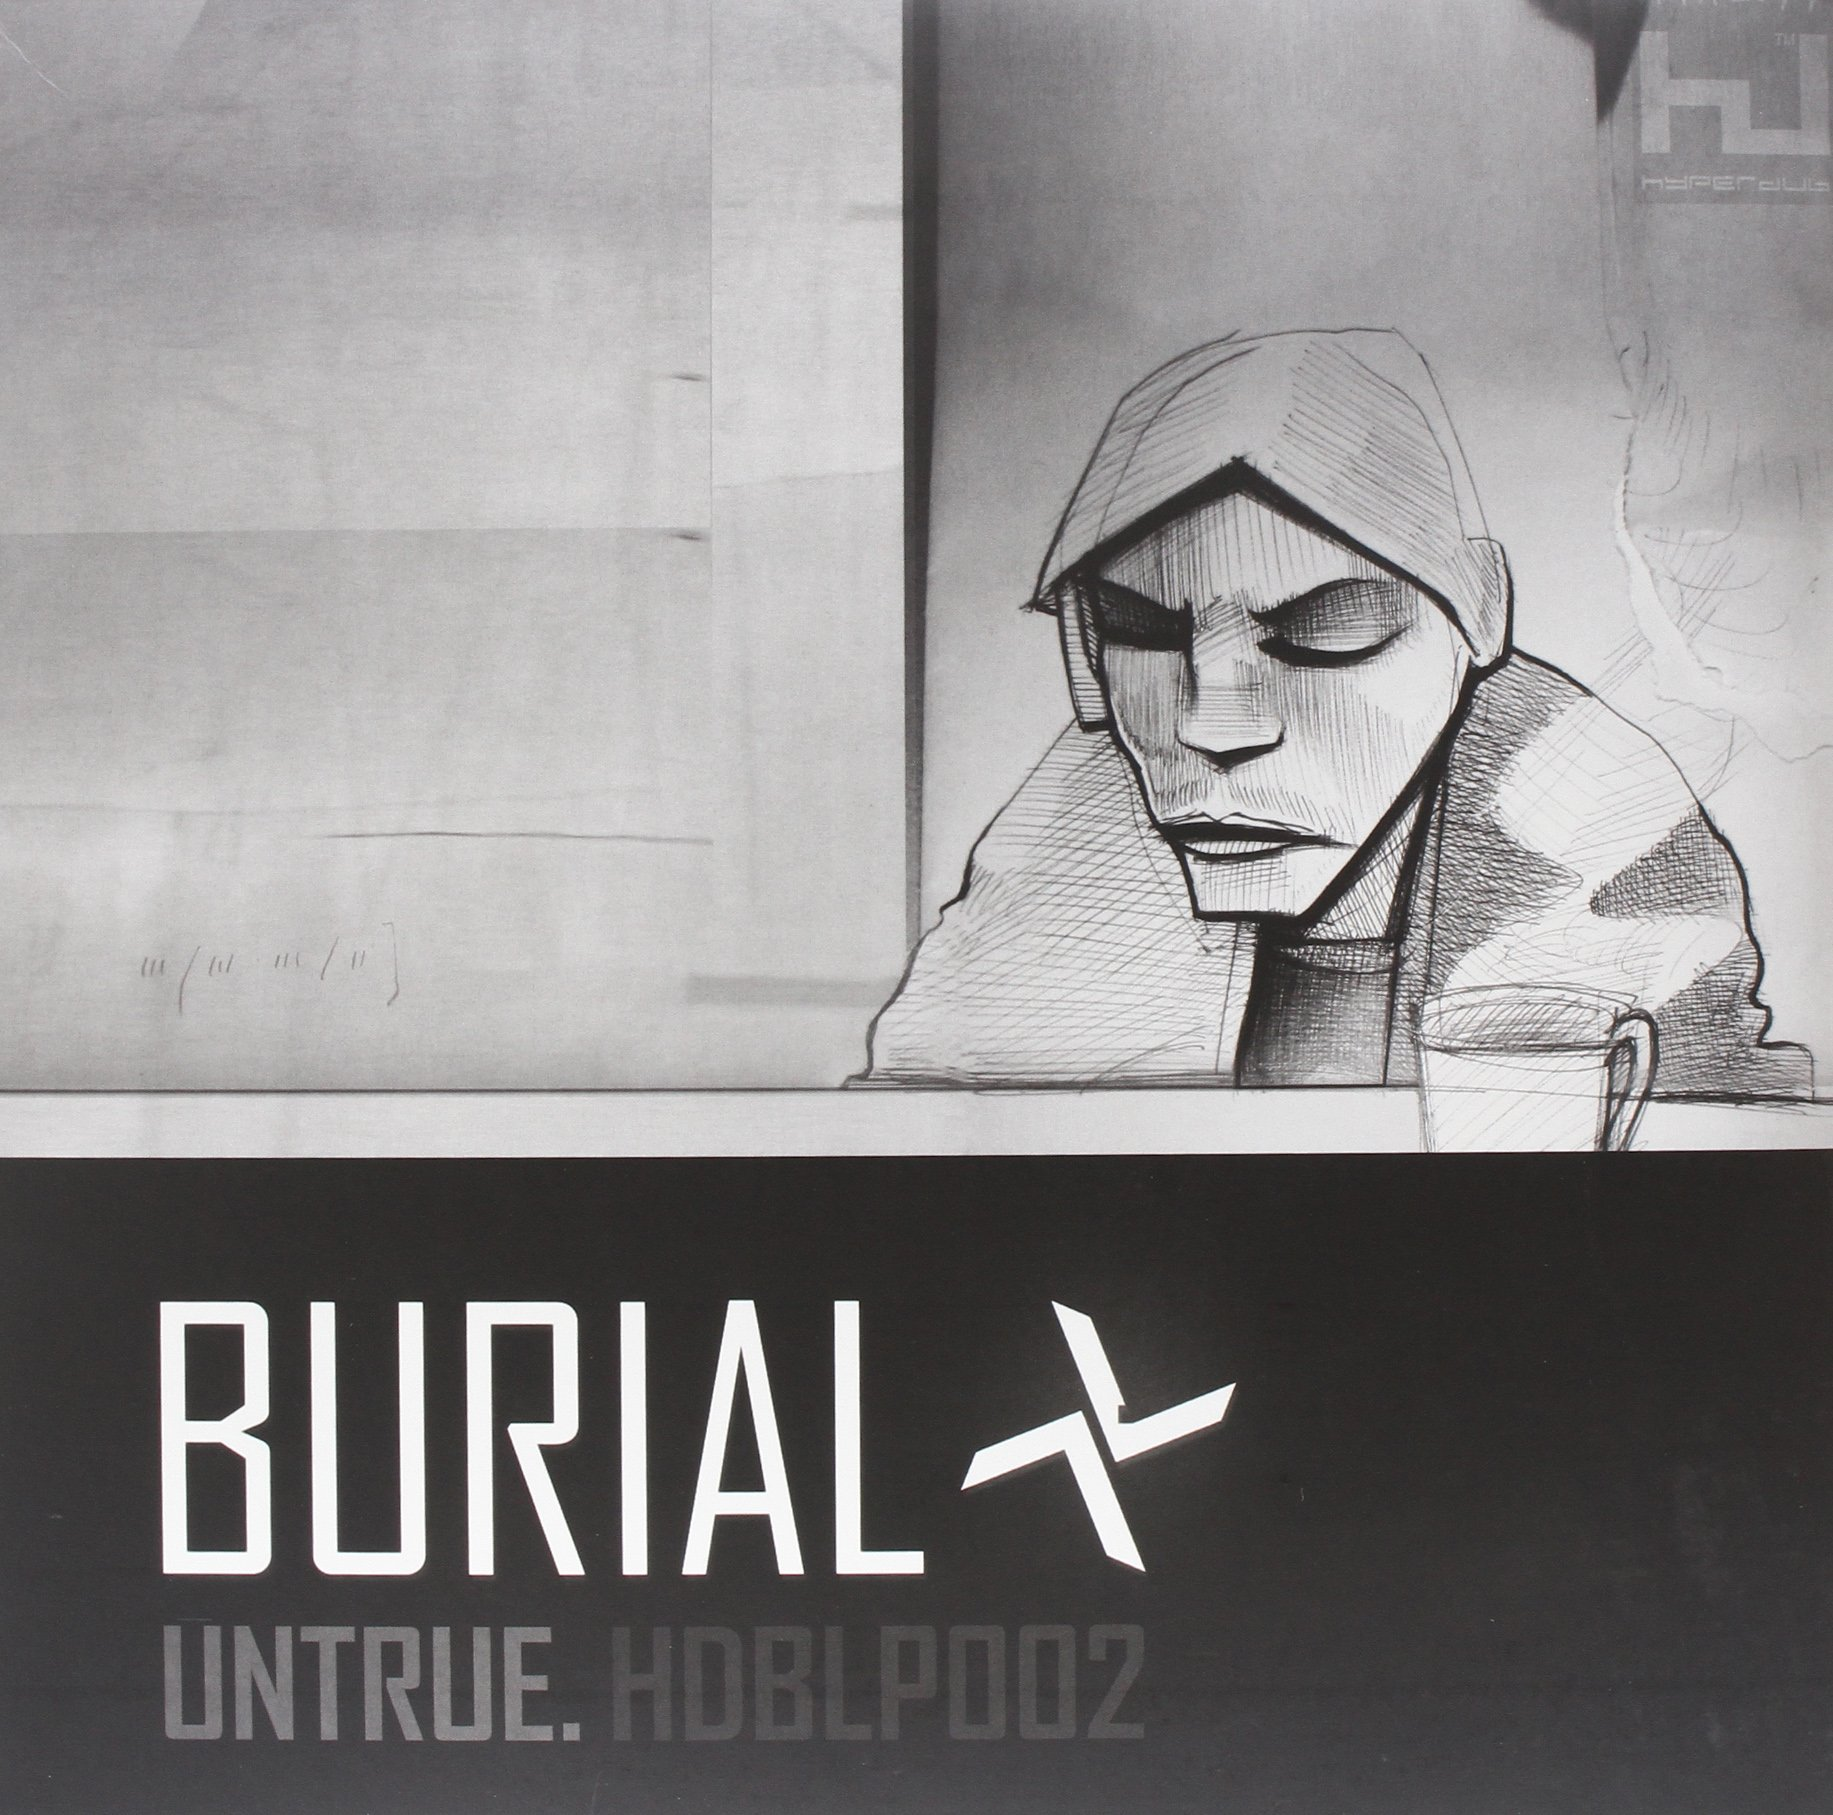 Untrue [Vinyl] by Hyperdub